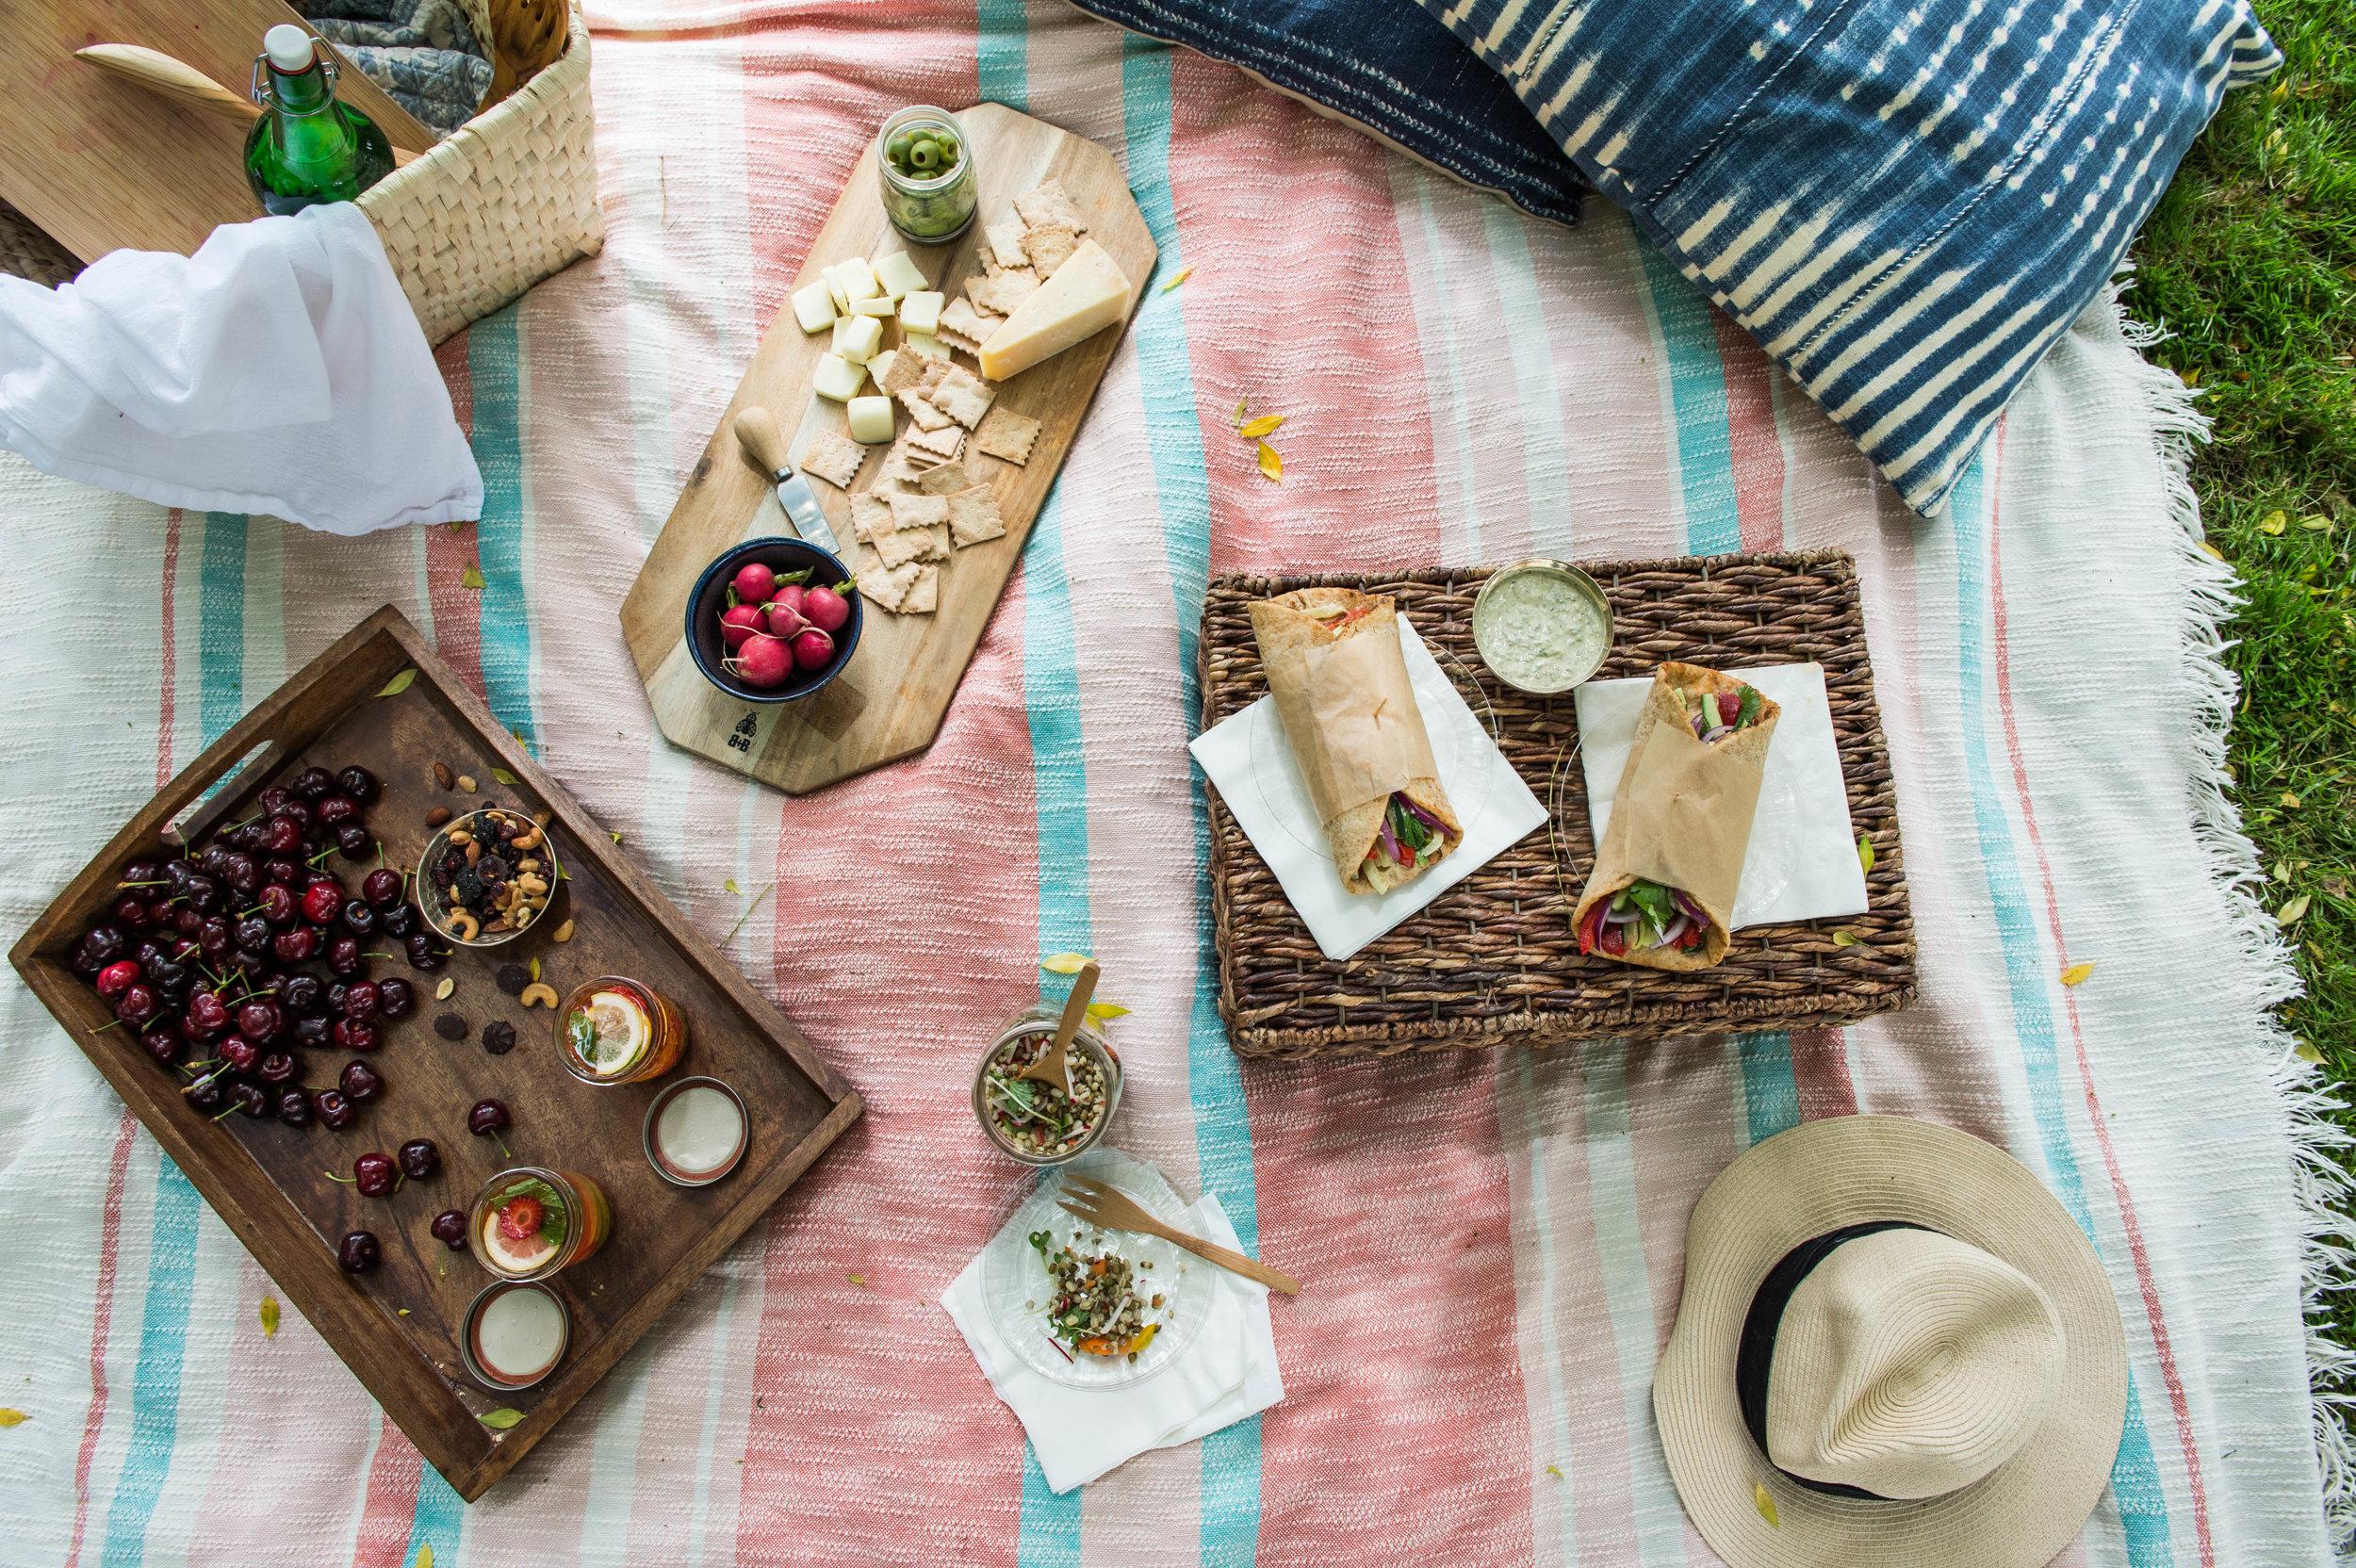 Pack a picnic